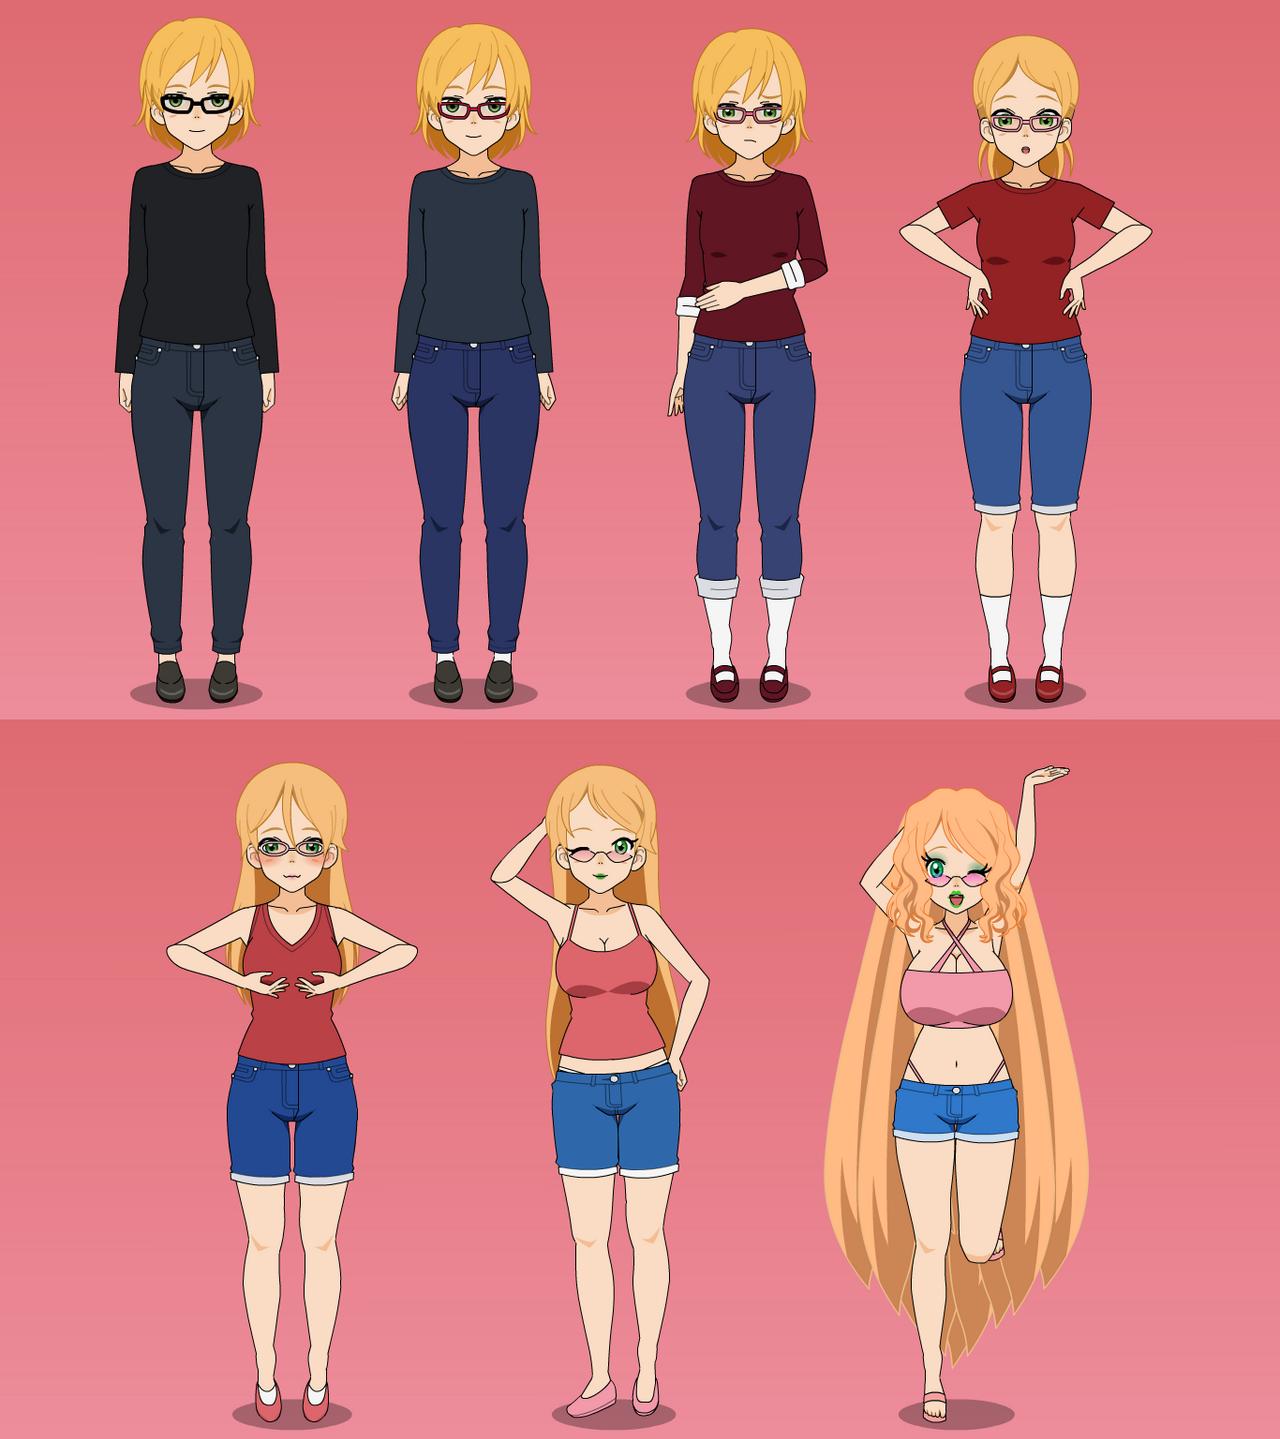 Bimbo transformation sequence